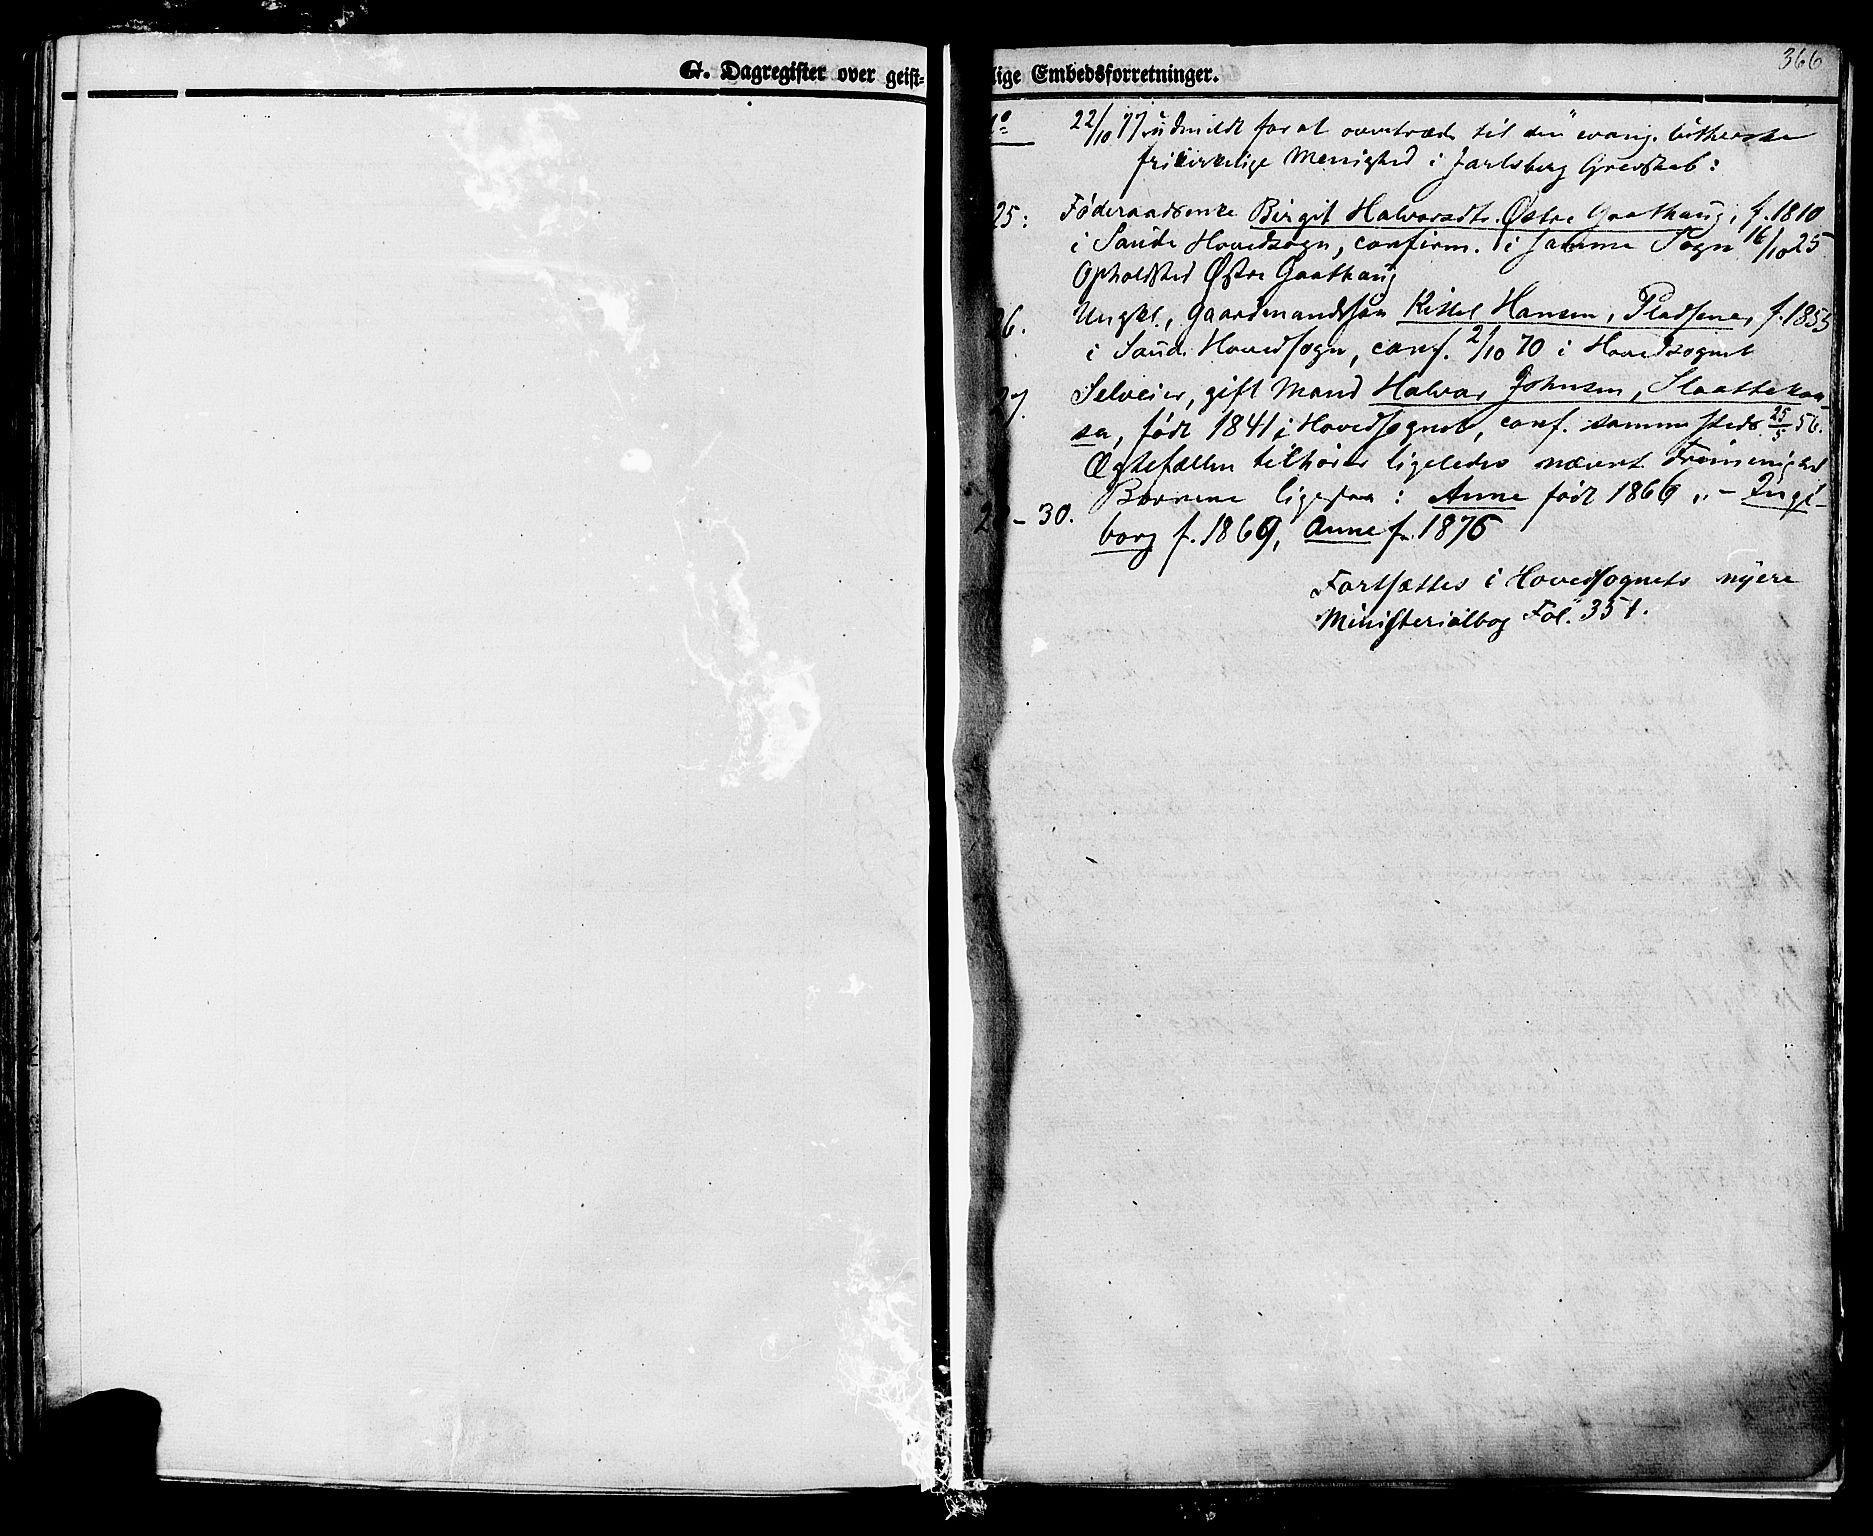 SAKO, Sauherad kirkebøker, F/Fa/L0007: Ministerialbok nr. I 7, 1851-1873, s. 366